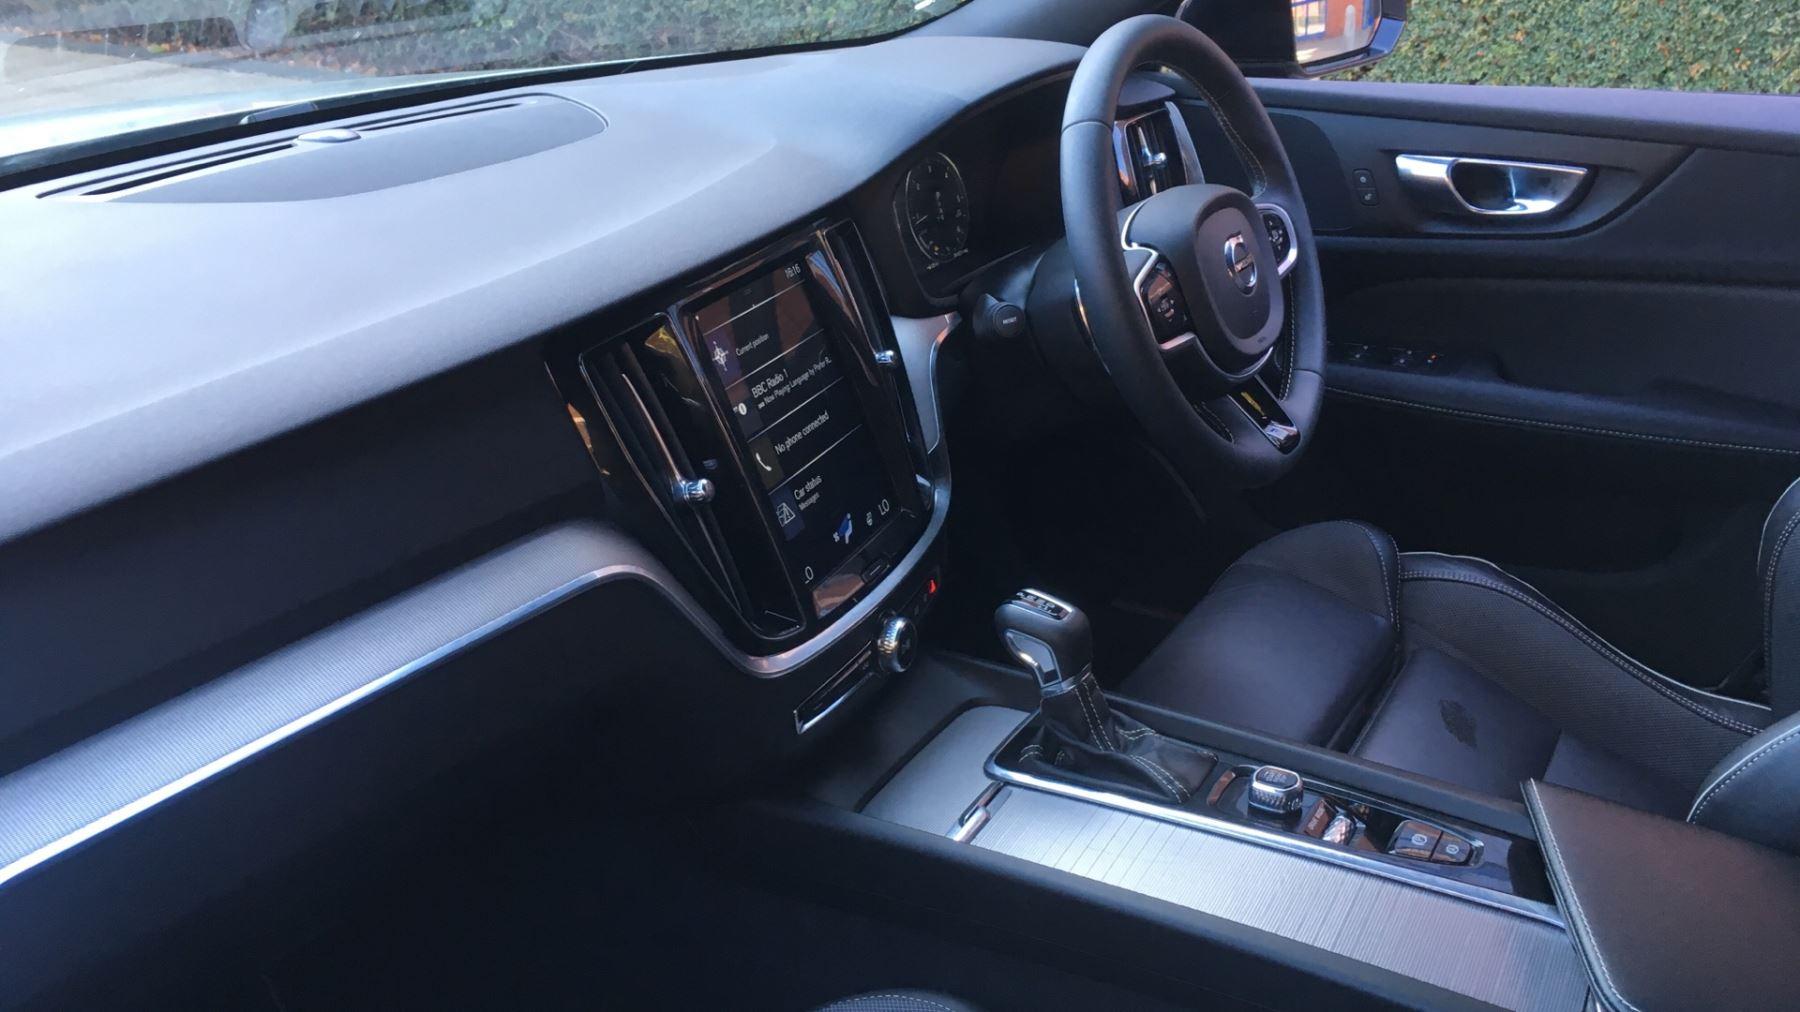 Volvo V60 2.0 D4 [190] R DESIGN 5dr - Volvo on Call, DAB Radio, SAT NAV, Park Assist image 3